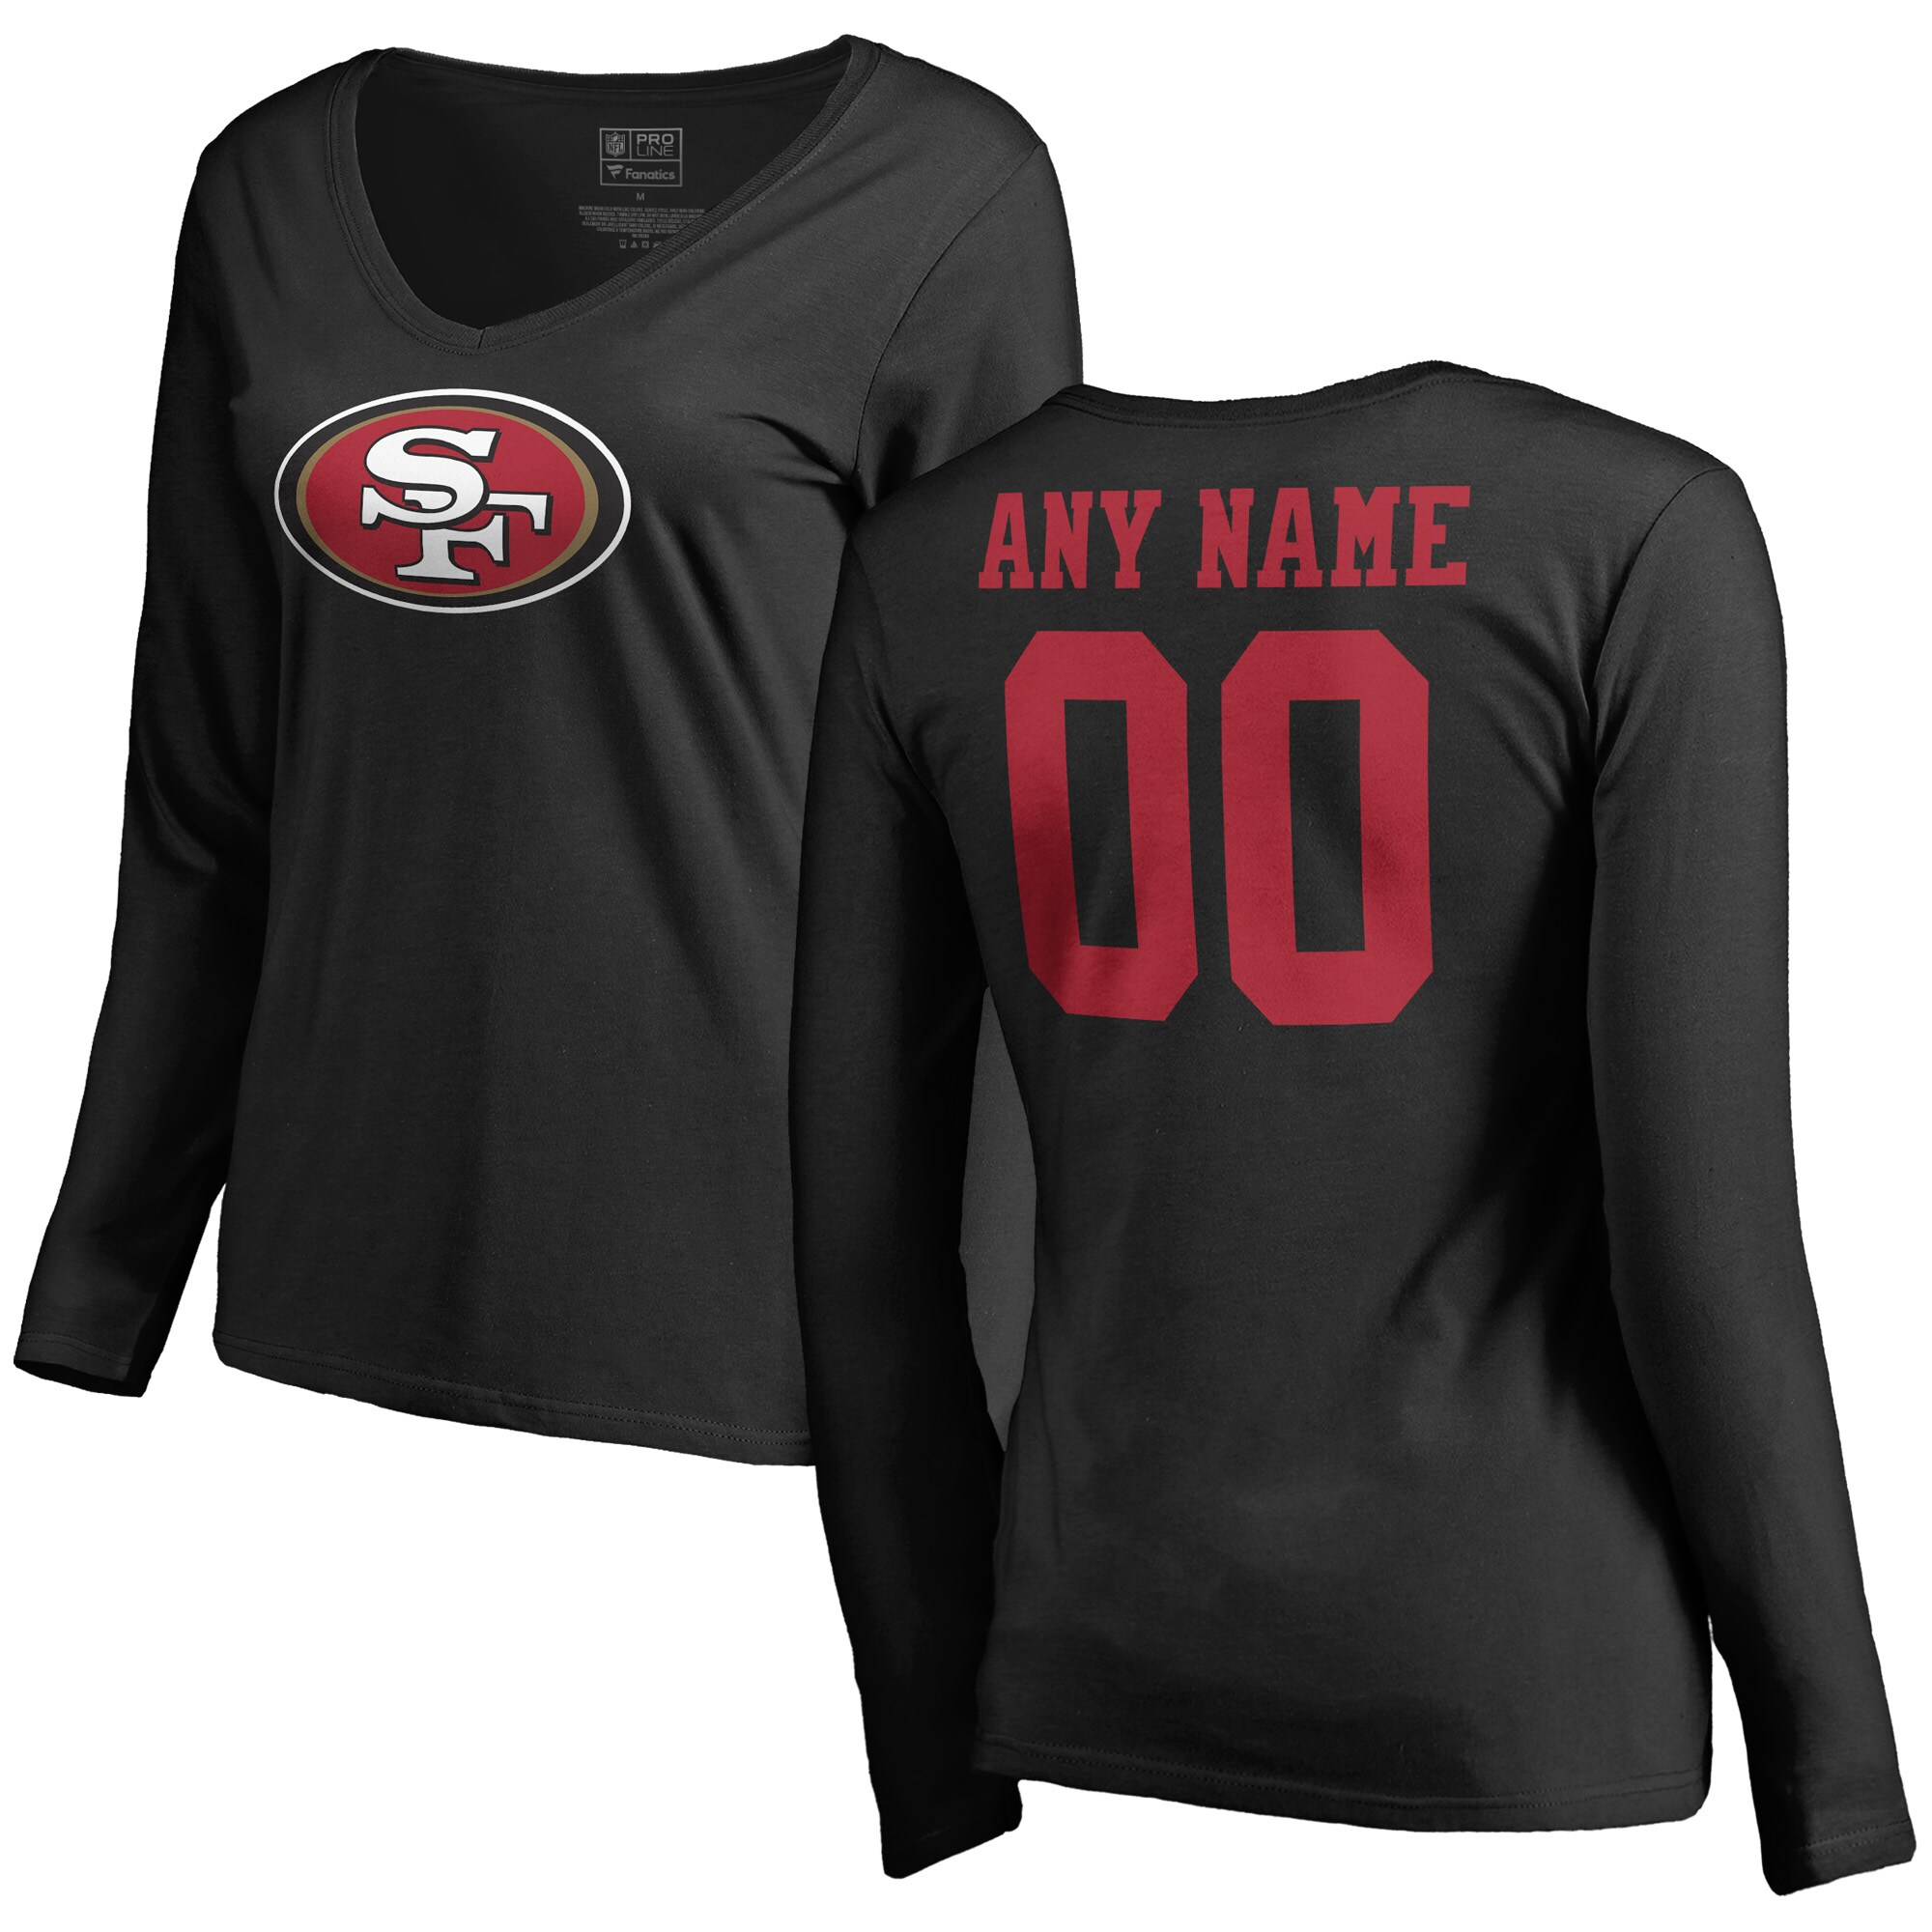 San Francisco 49ers NFL Pro Line Women's Personalized Name & Number Logo Long Sleeve T-Shirt - Black